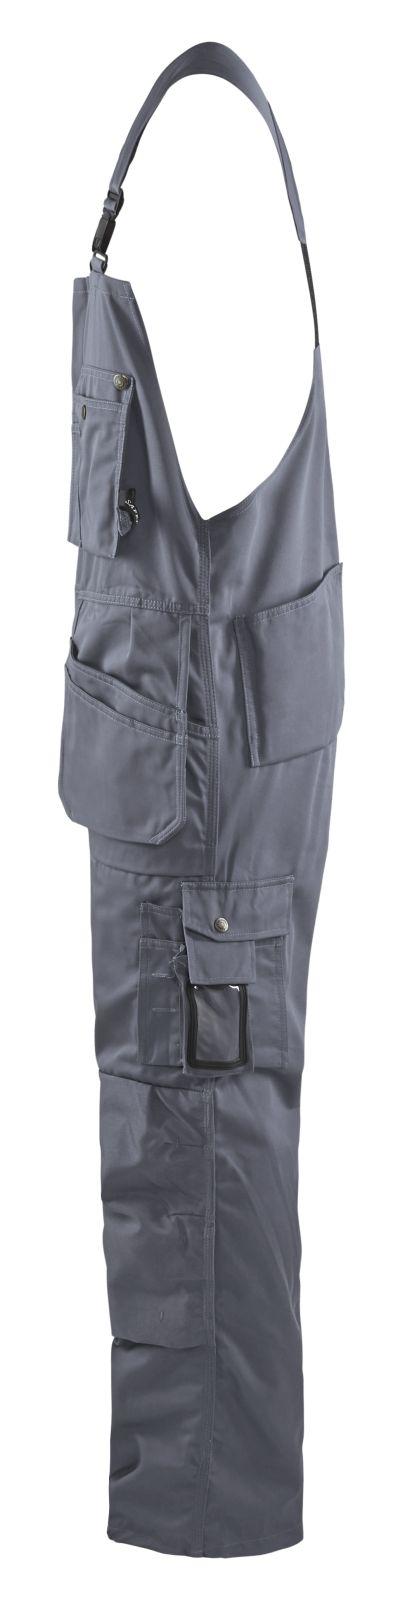 Blaklader Amerikaanse overalls 26021860 grijs(9400)